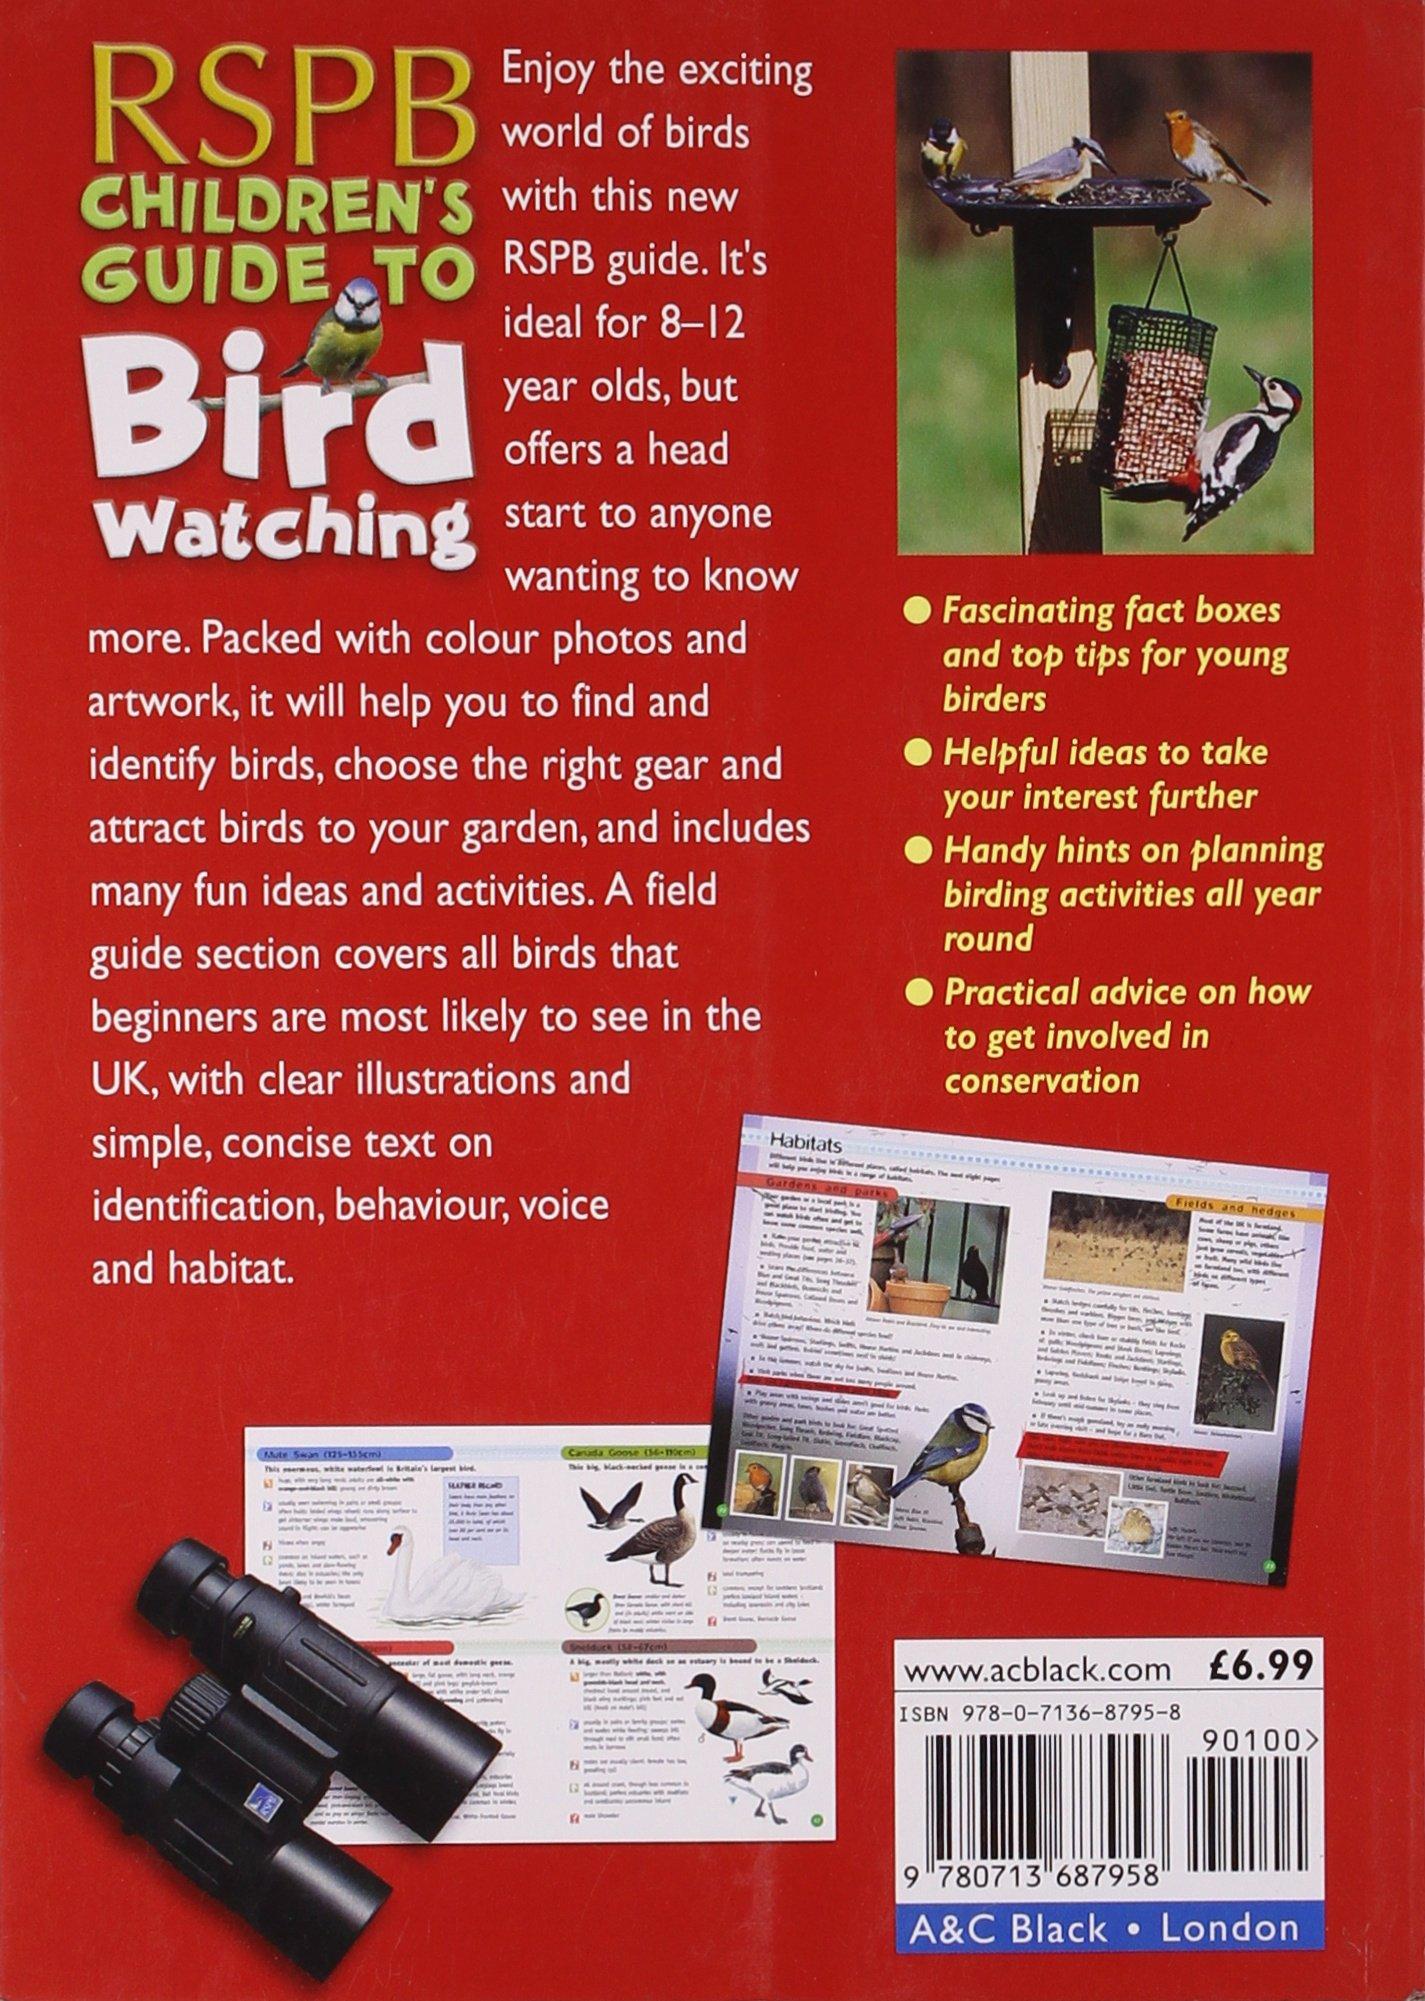 Rspb Childrens Guide To Birdwatching Professor Of Chemistry David Chandler 9780713687958 Amazon Books